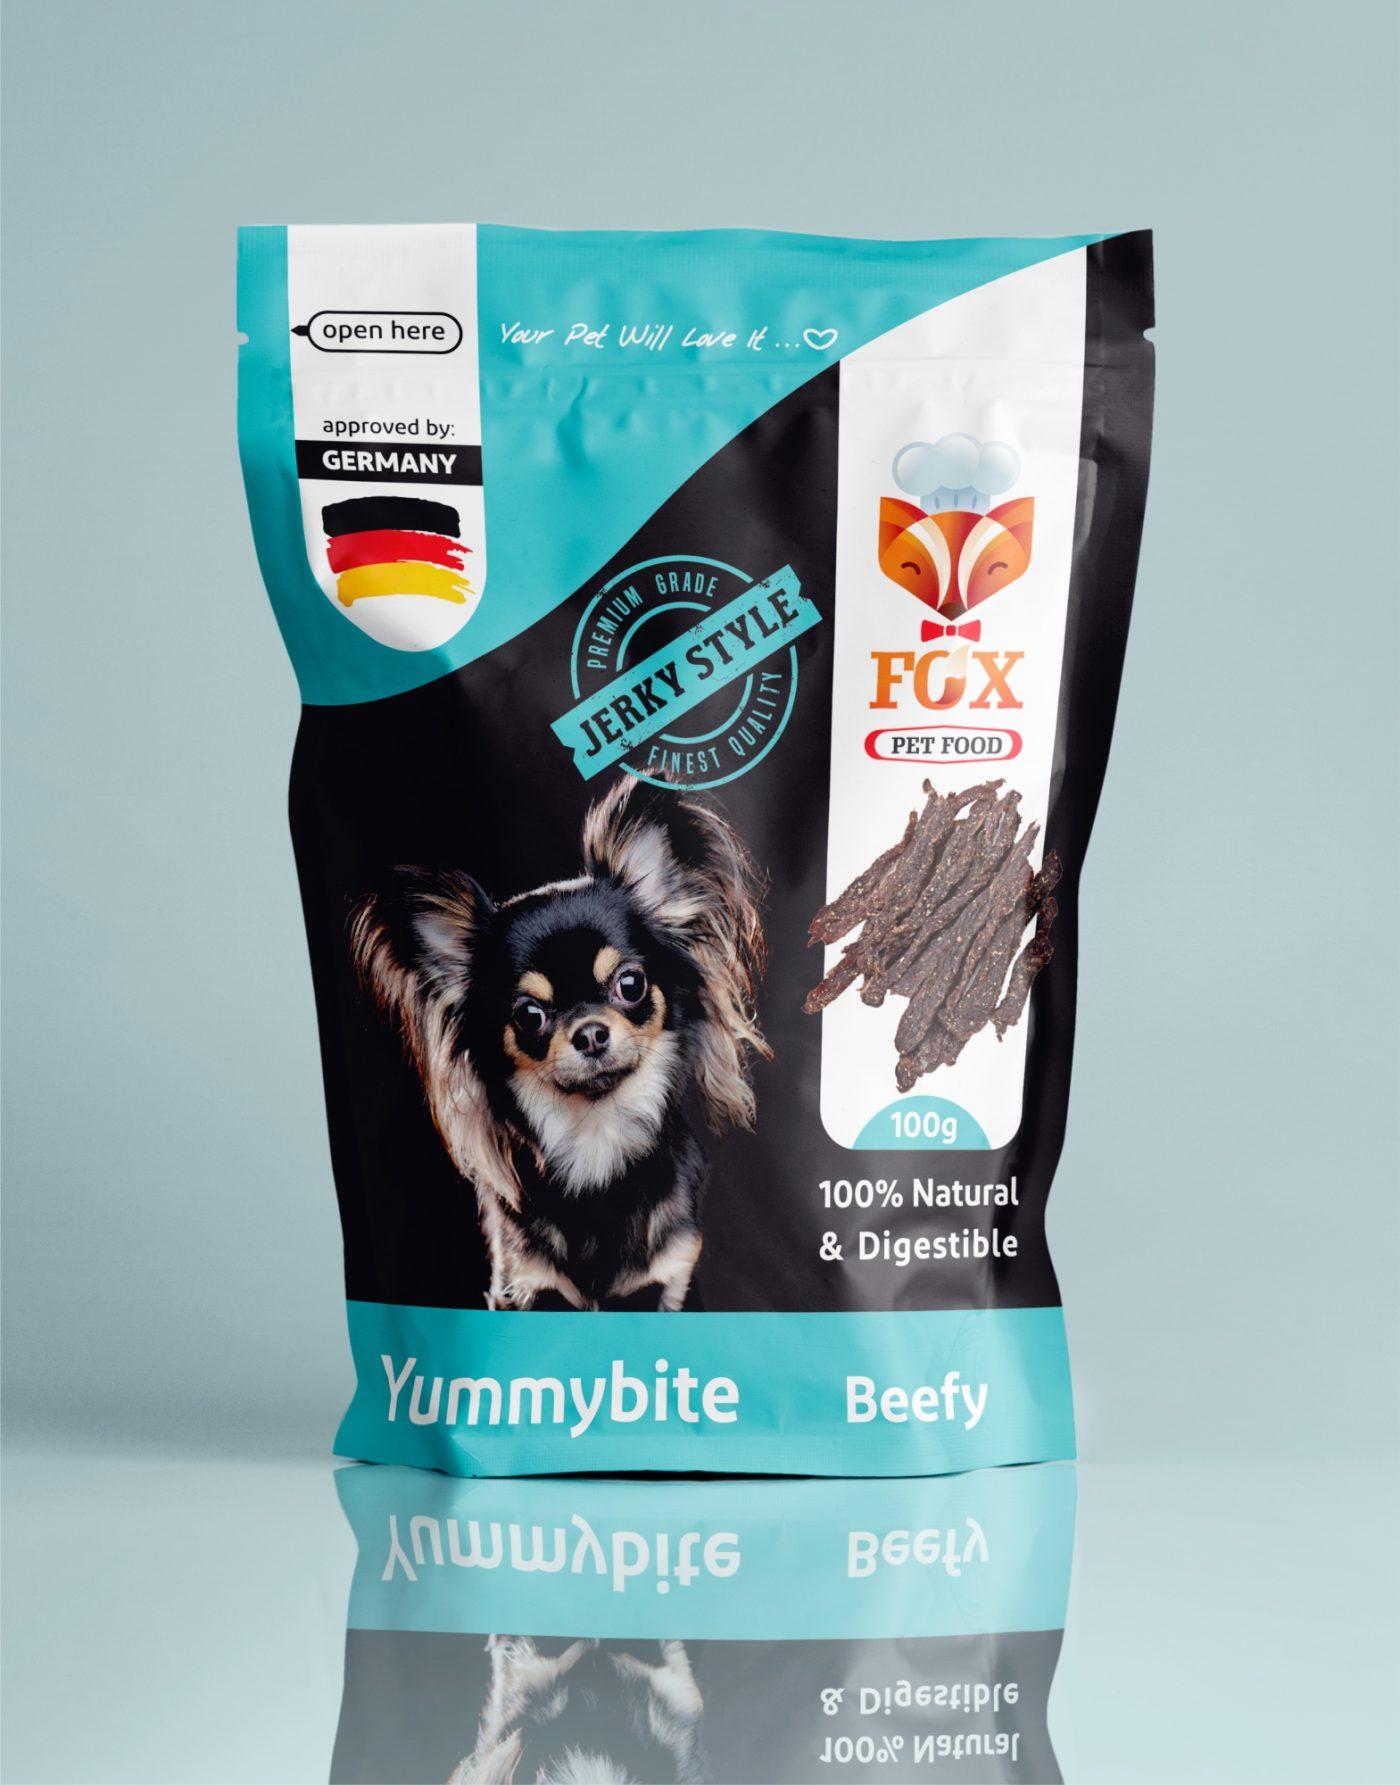 yummybite-beefy-100g-front